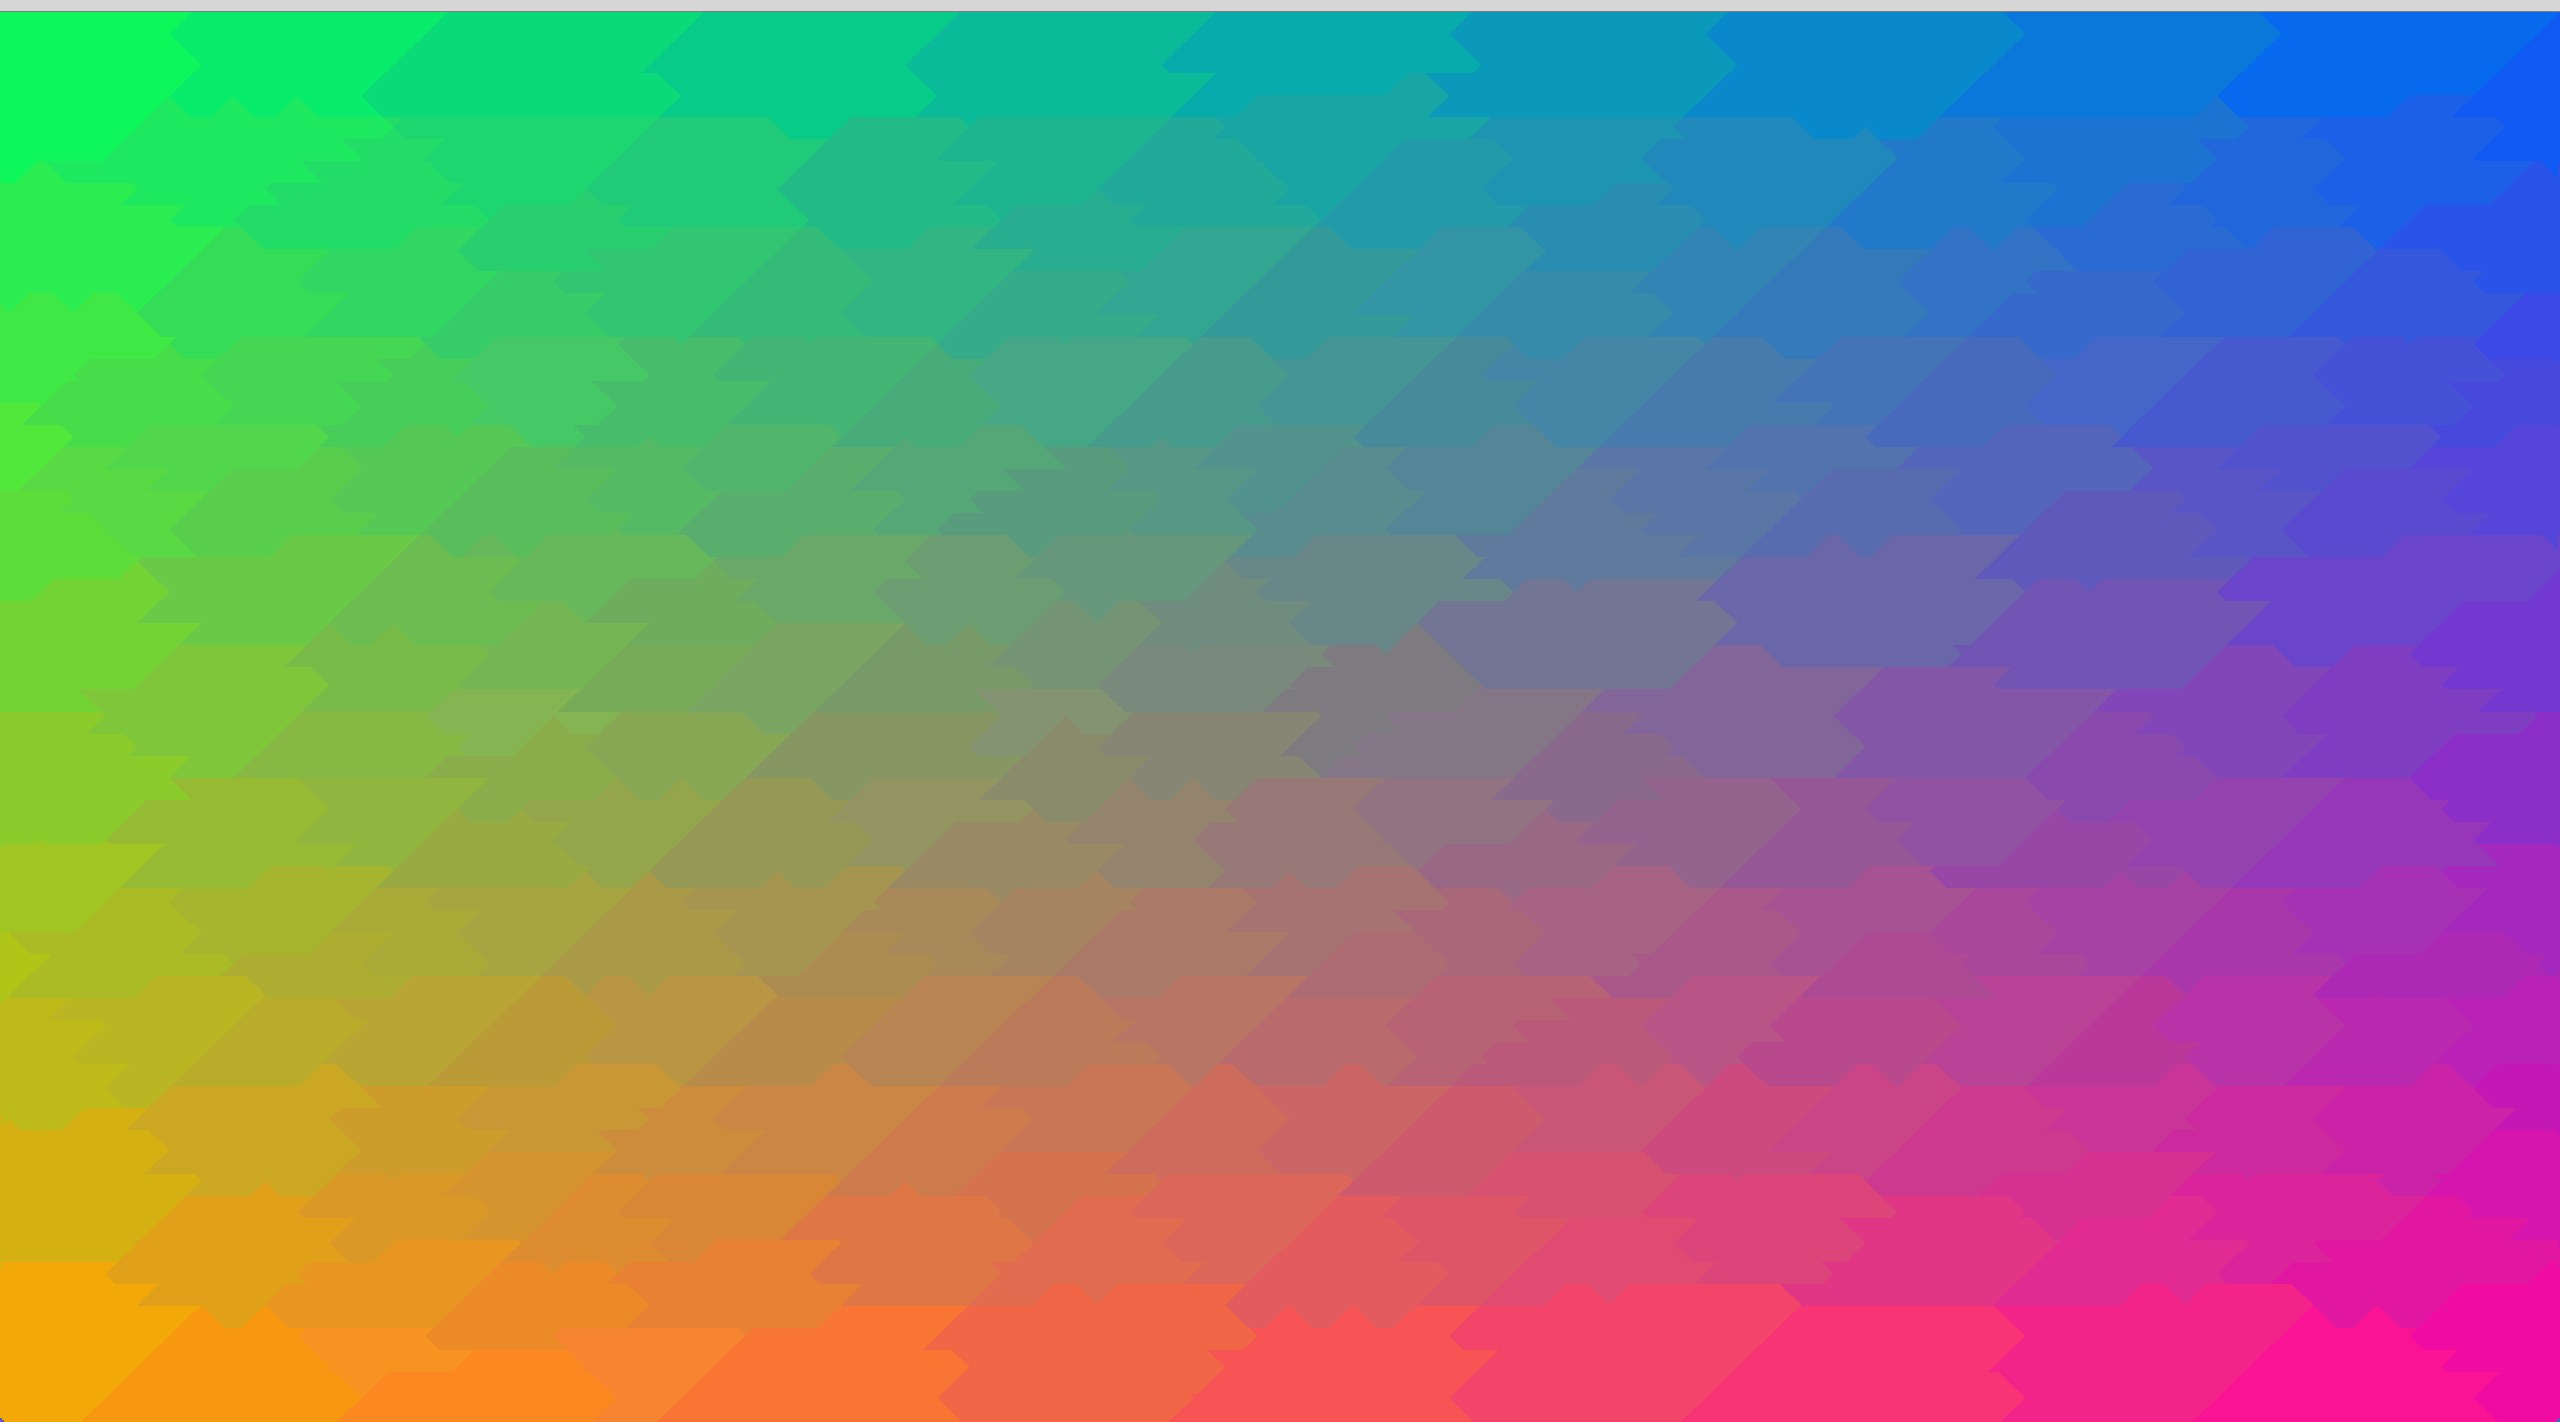 background Gradient ·① Download free High Resolution